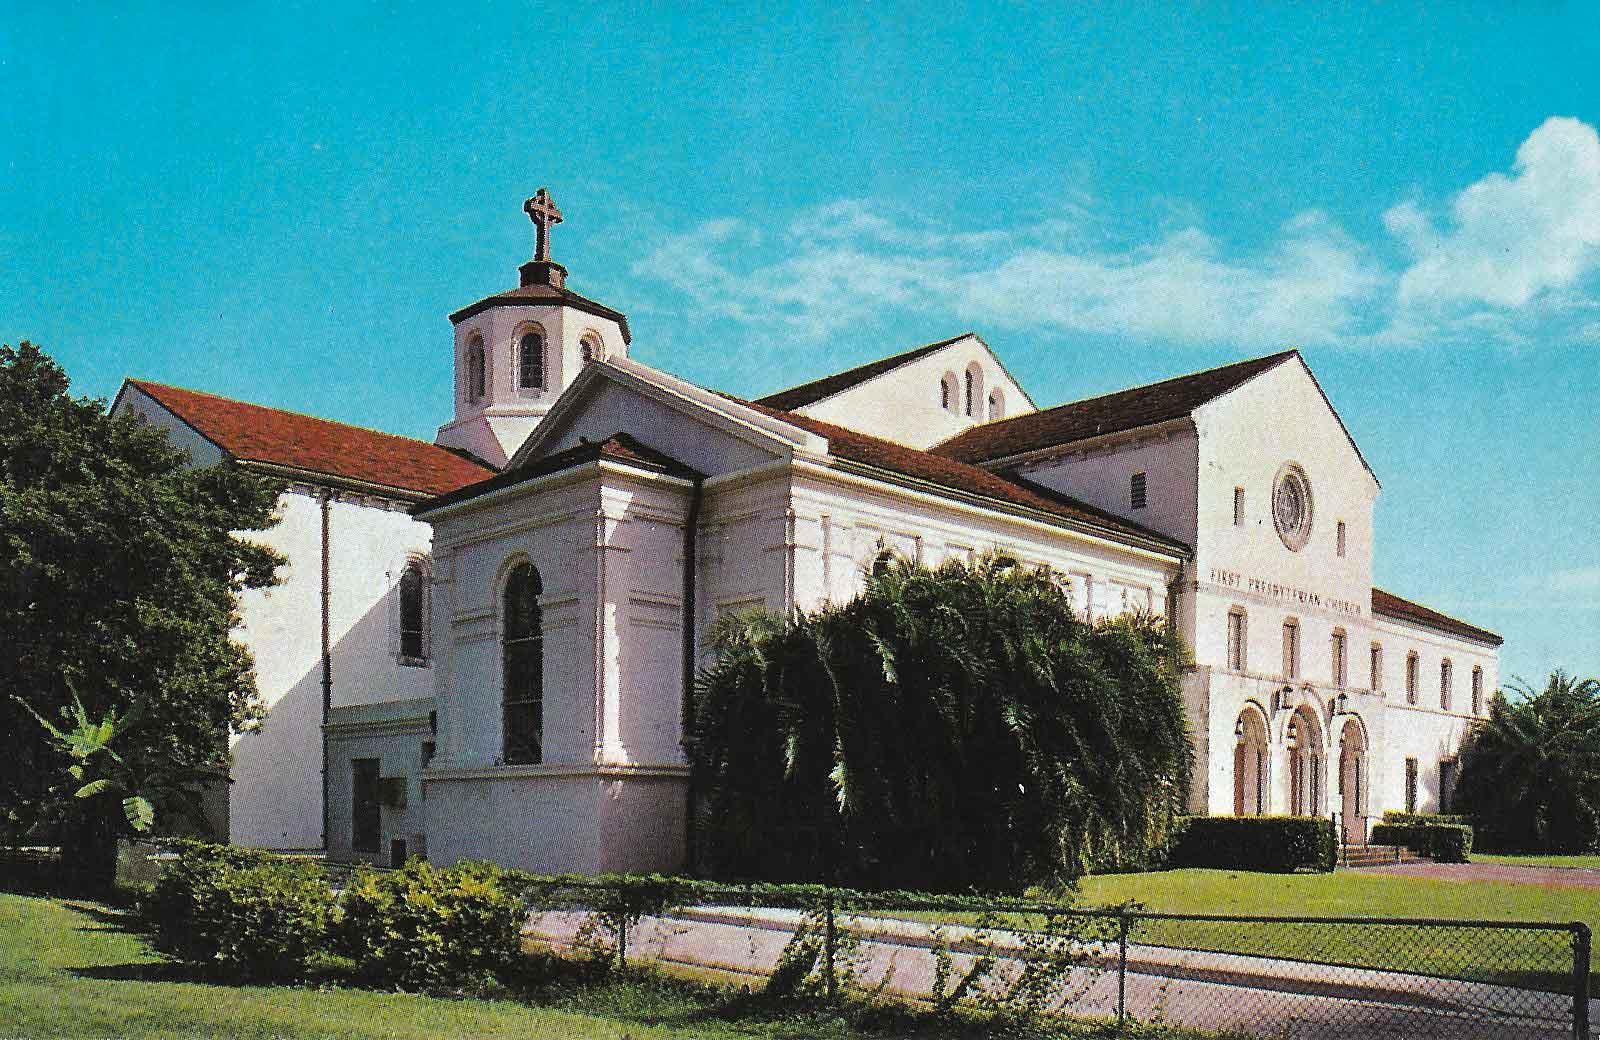 Church easement big step to expand public baywalk